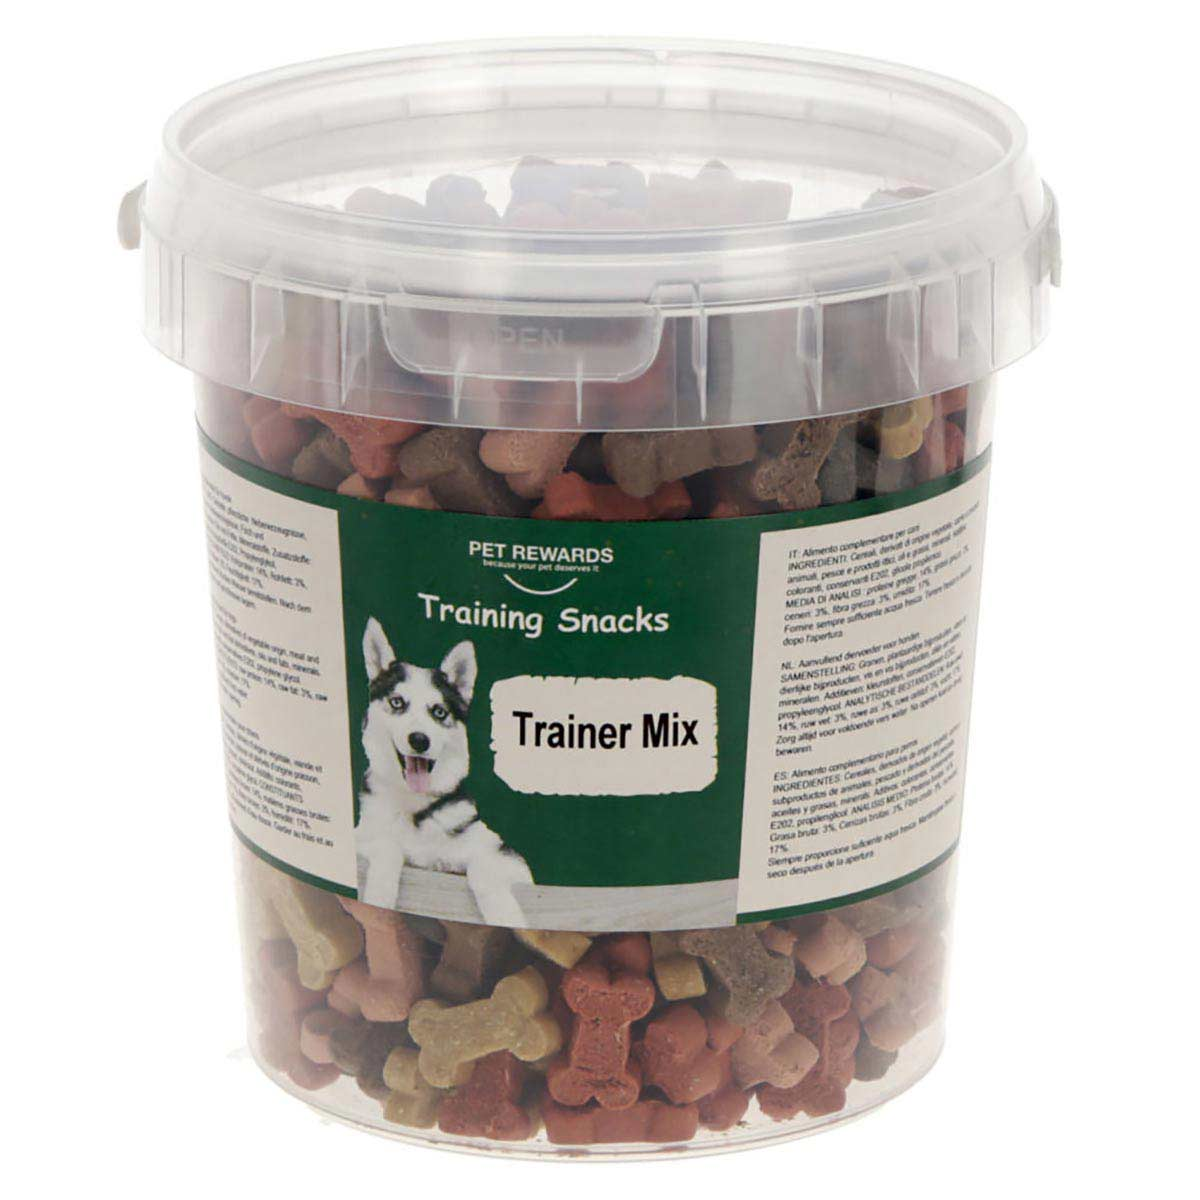 Pet Rewards Trainer Mix